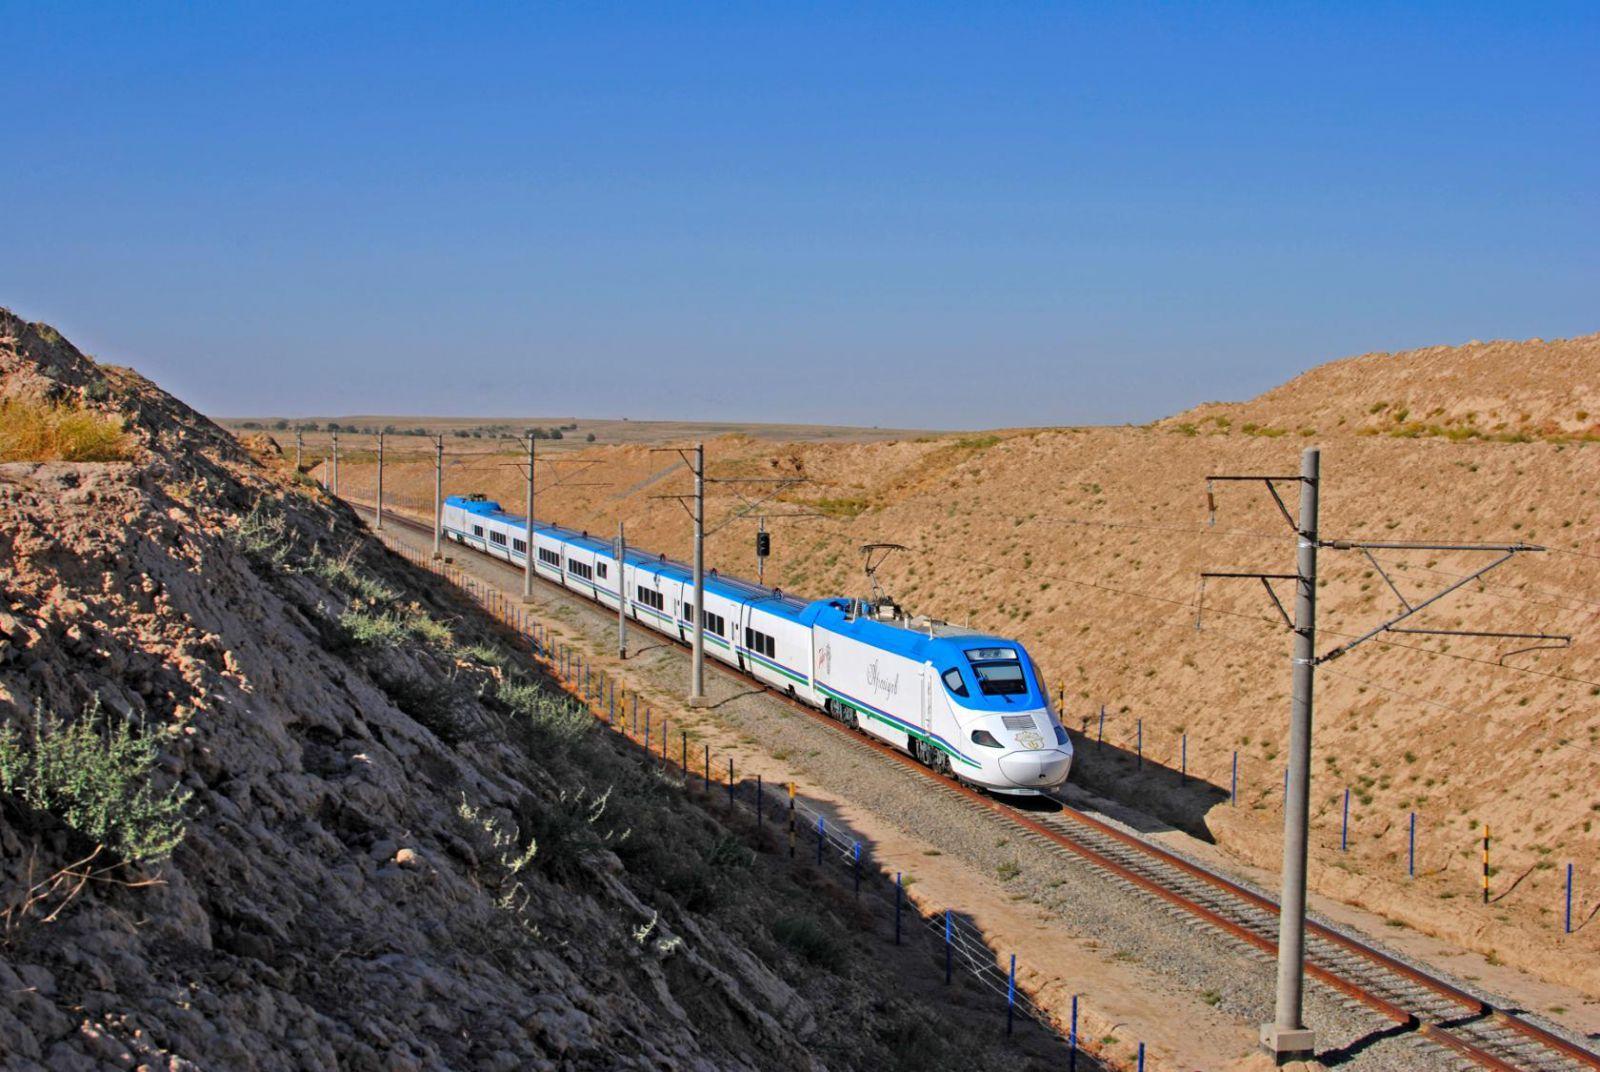 """Афросиаб"" на участке Самарканд - Капли, электропоезд Talgo-250,Узбекистан Самаркандская область."